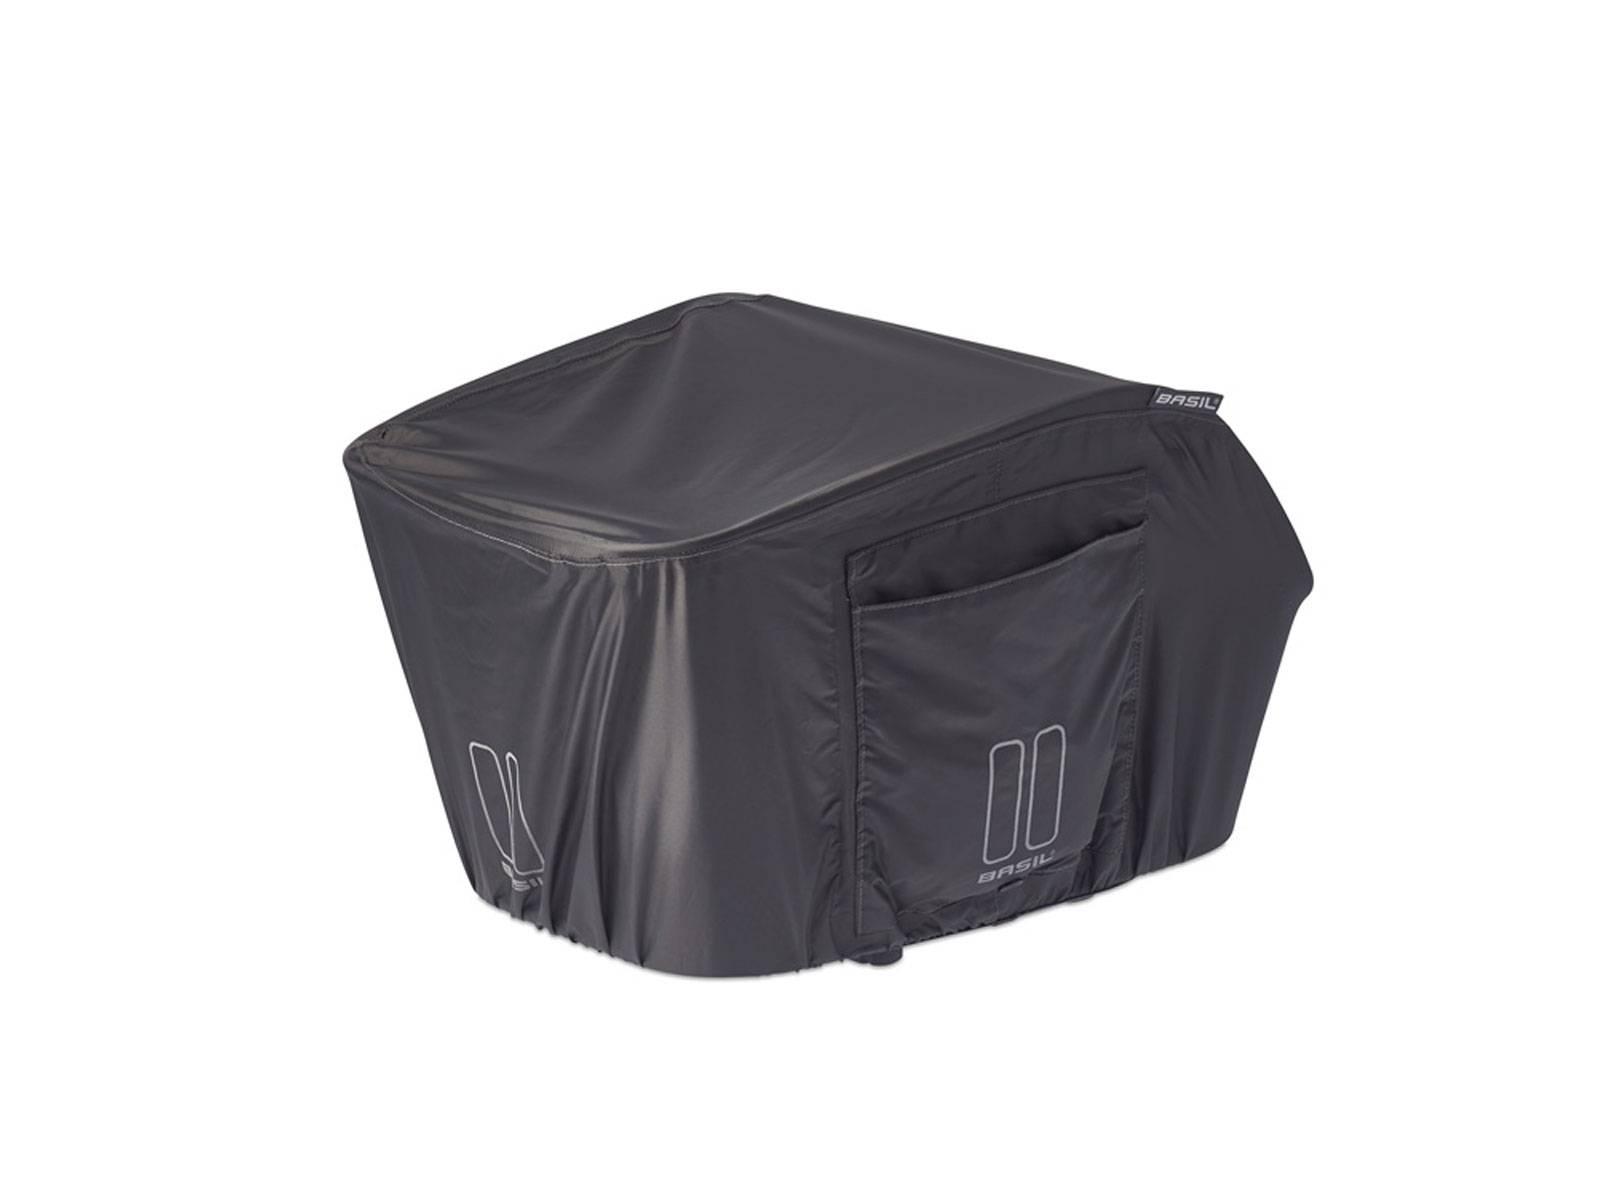 basil regenhaube l fahrradkorb icon l bold l fahrradkomfort. Black Bedroom Furniture Sets. Home Design Ideas